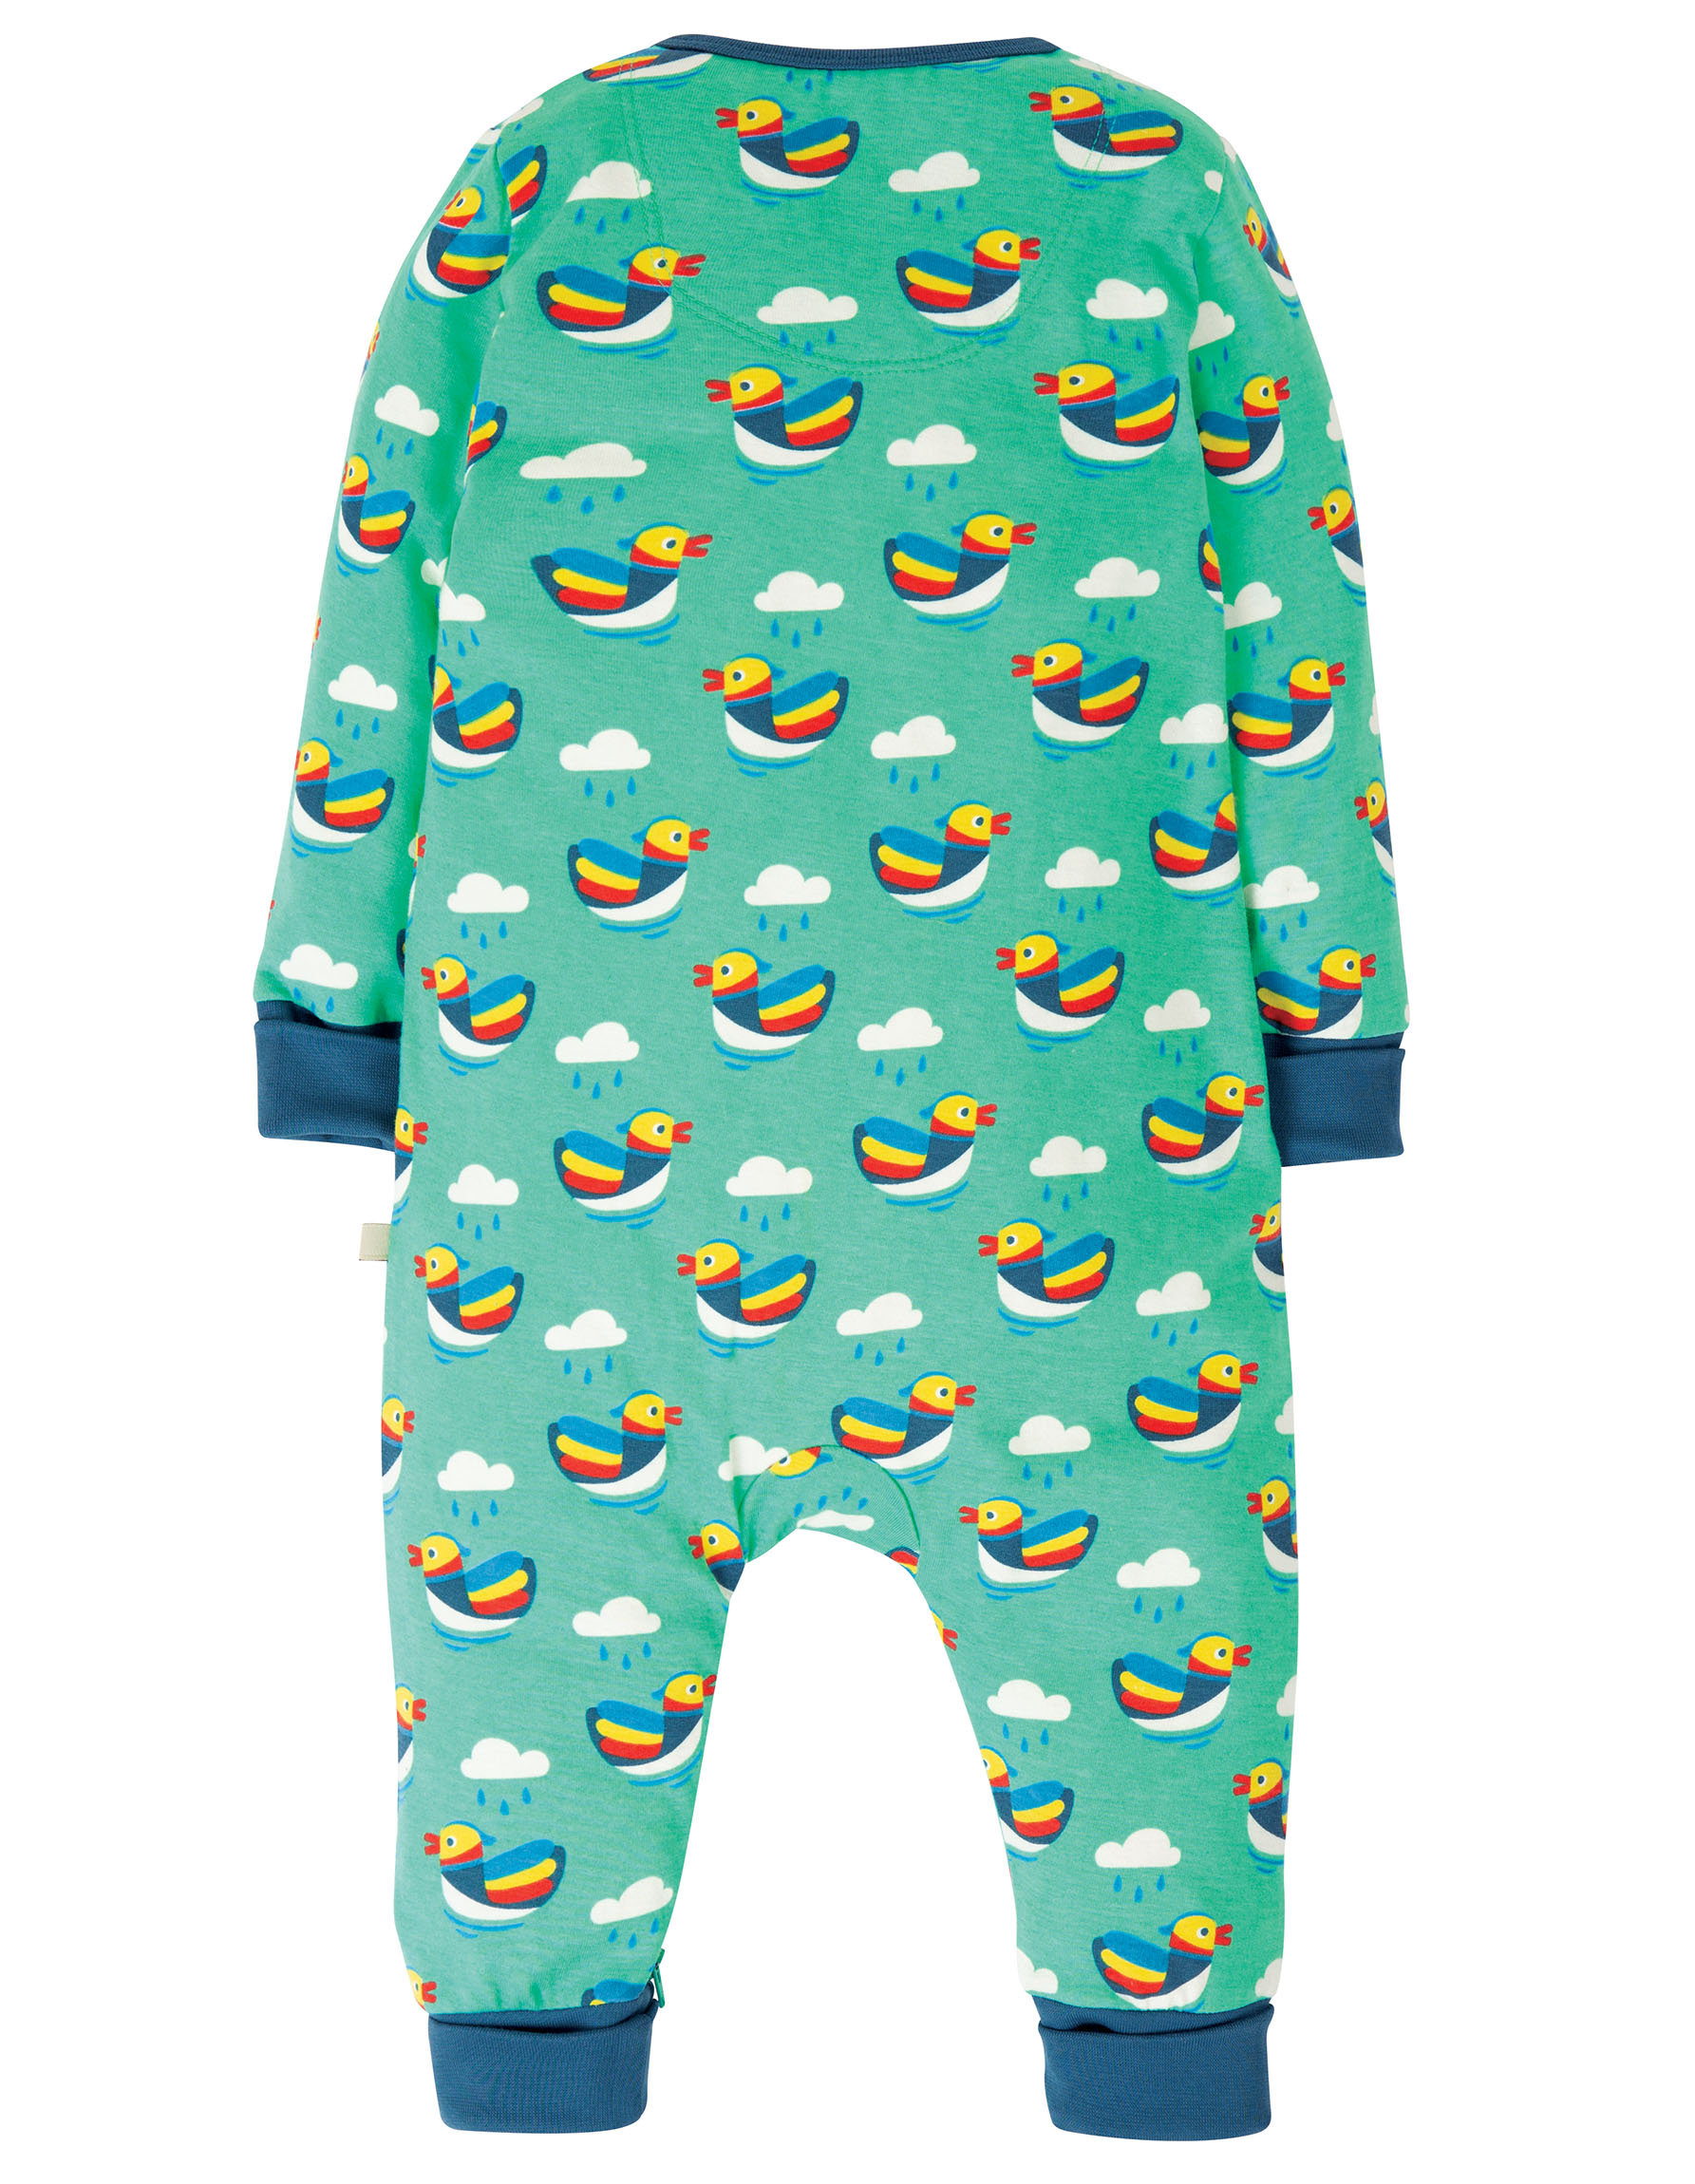 Frugi - Summer zip babygrow - Mandarin Ducks